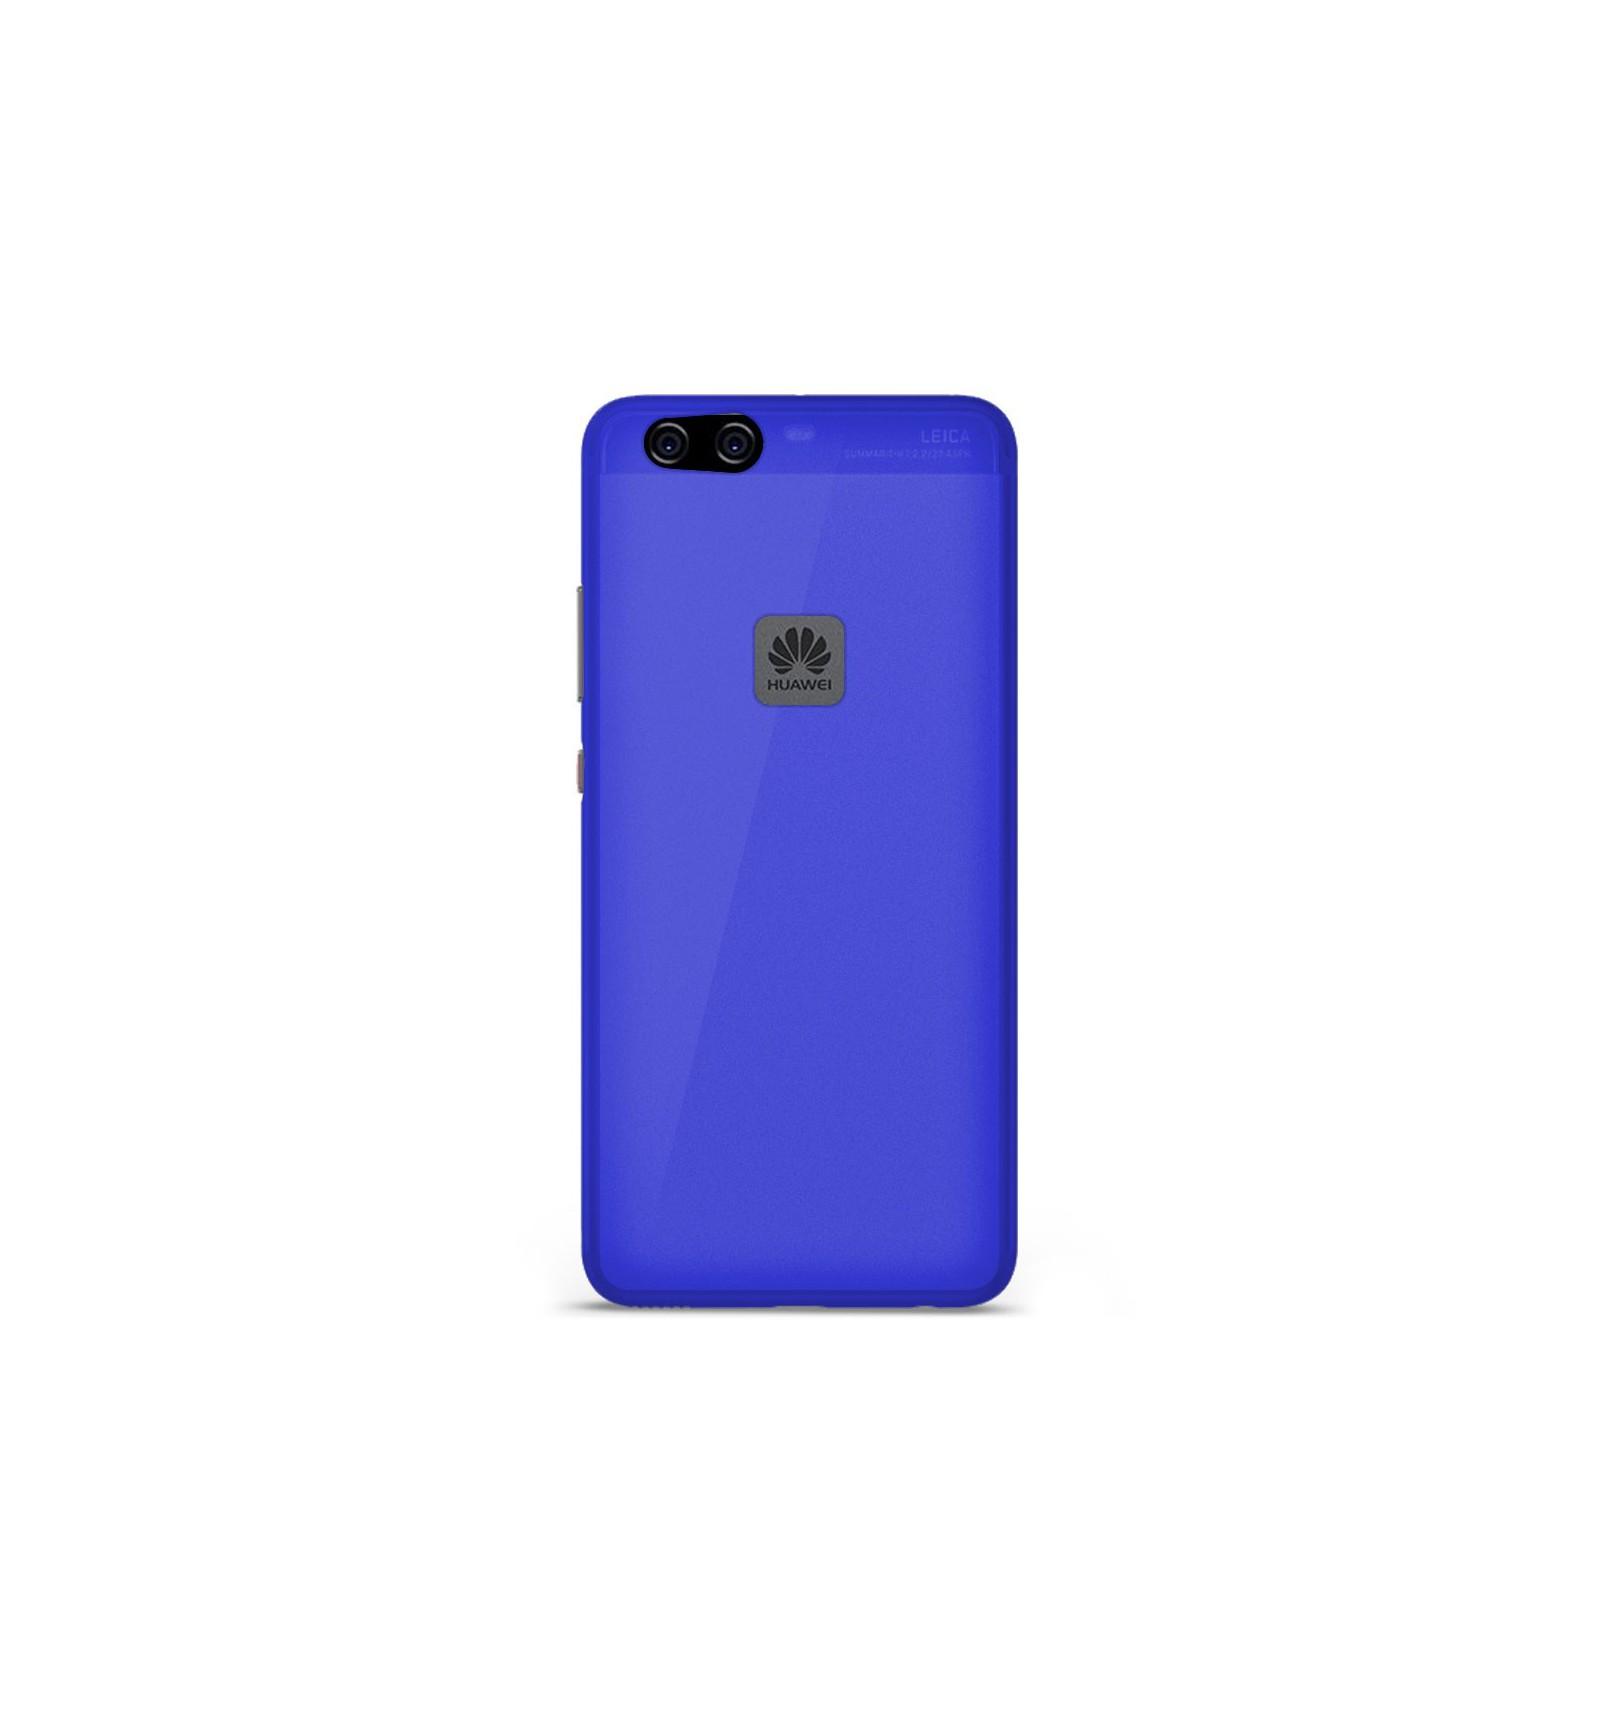 coque silicone huawei p10 lite bleu